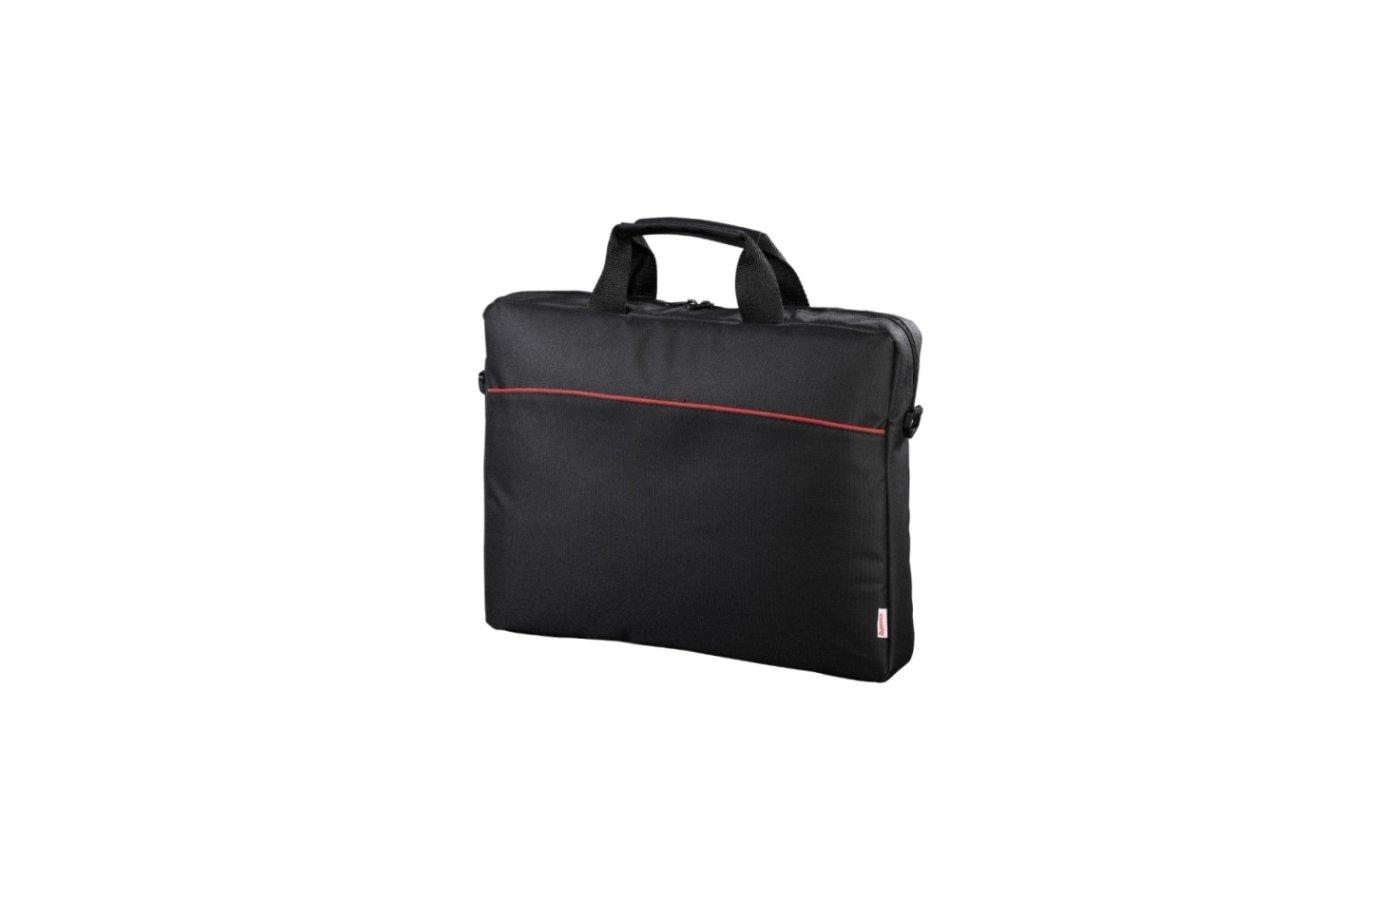 Кейс для ноутбука Hama Tortuga для ноутбука 17.3 черный полиэстер (00101240)